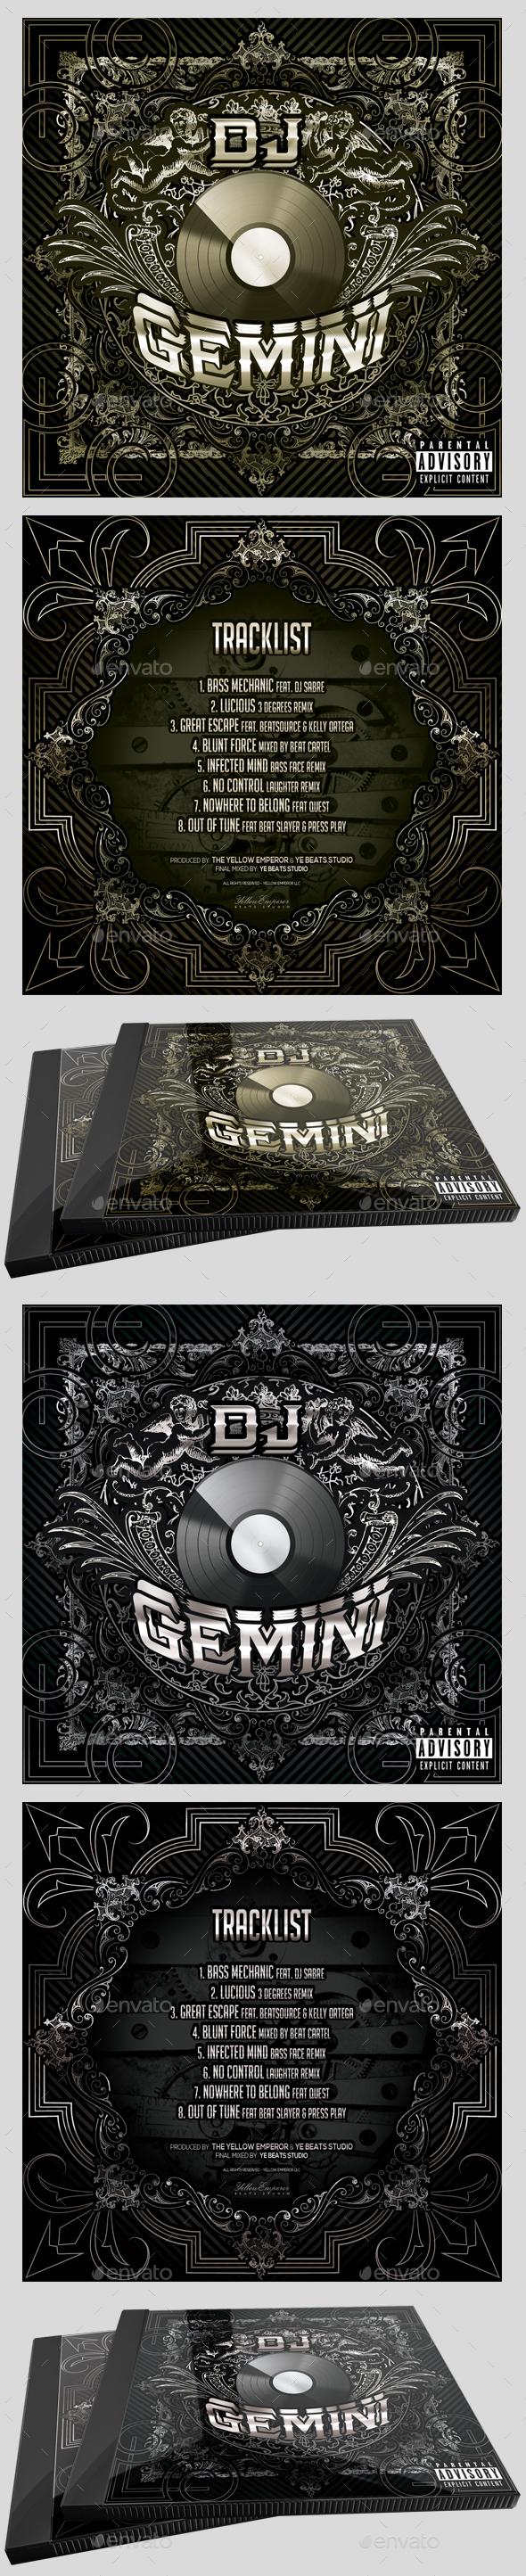 DJ CD Cover Artwork Template - CD & DVD Artwork Print Templates